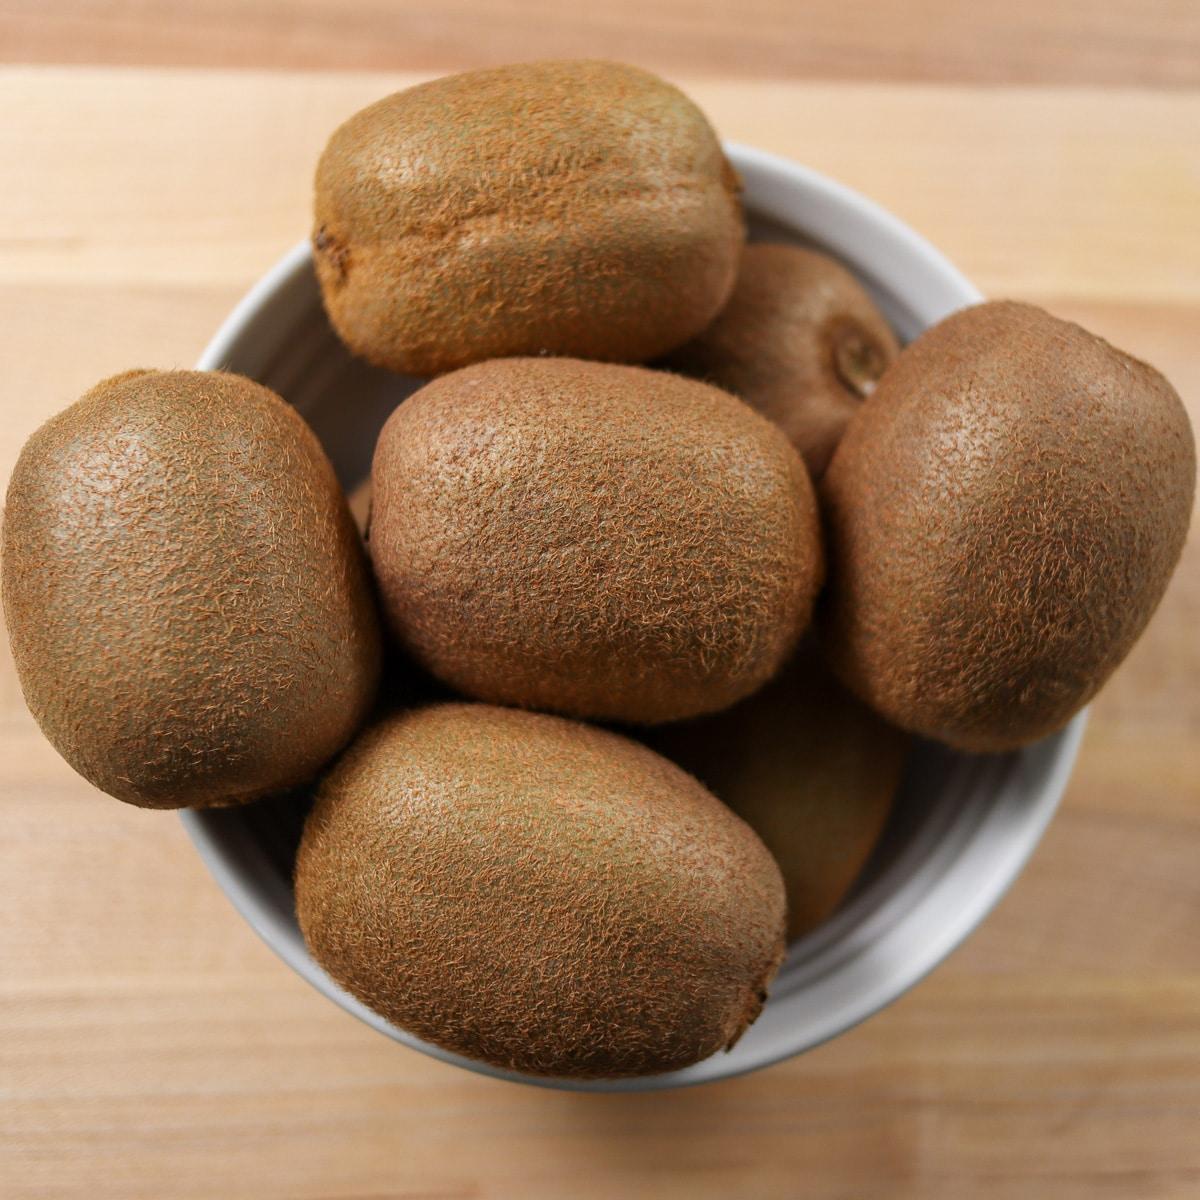 kiwi in a bowl